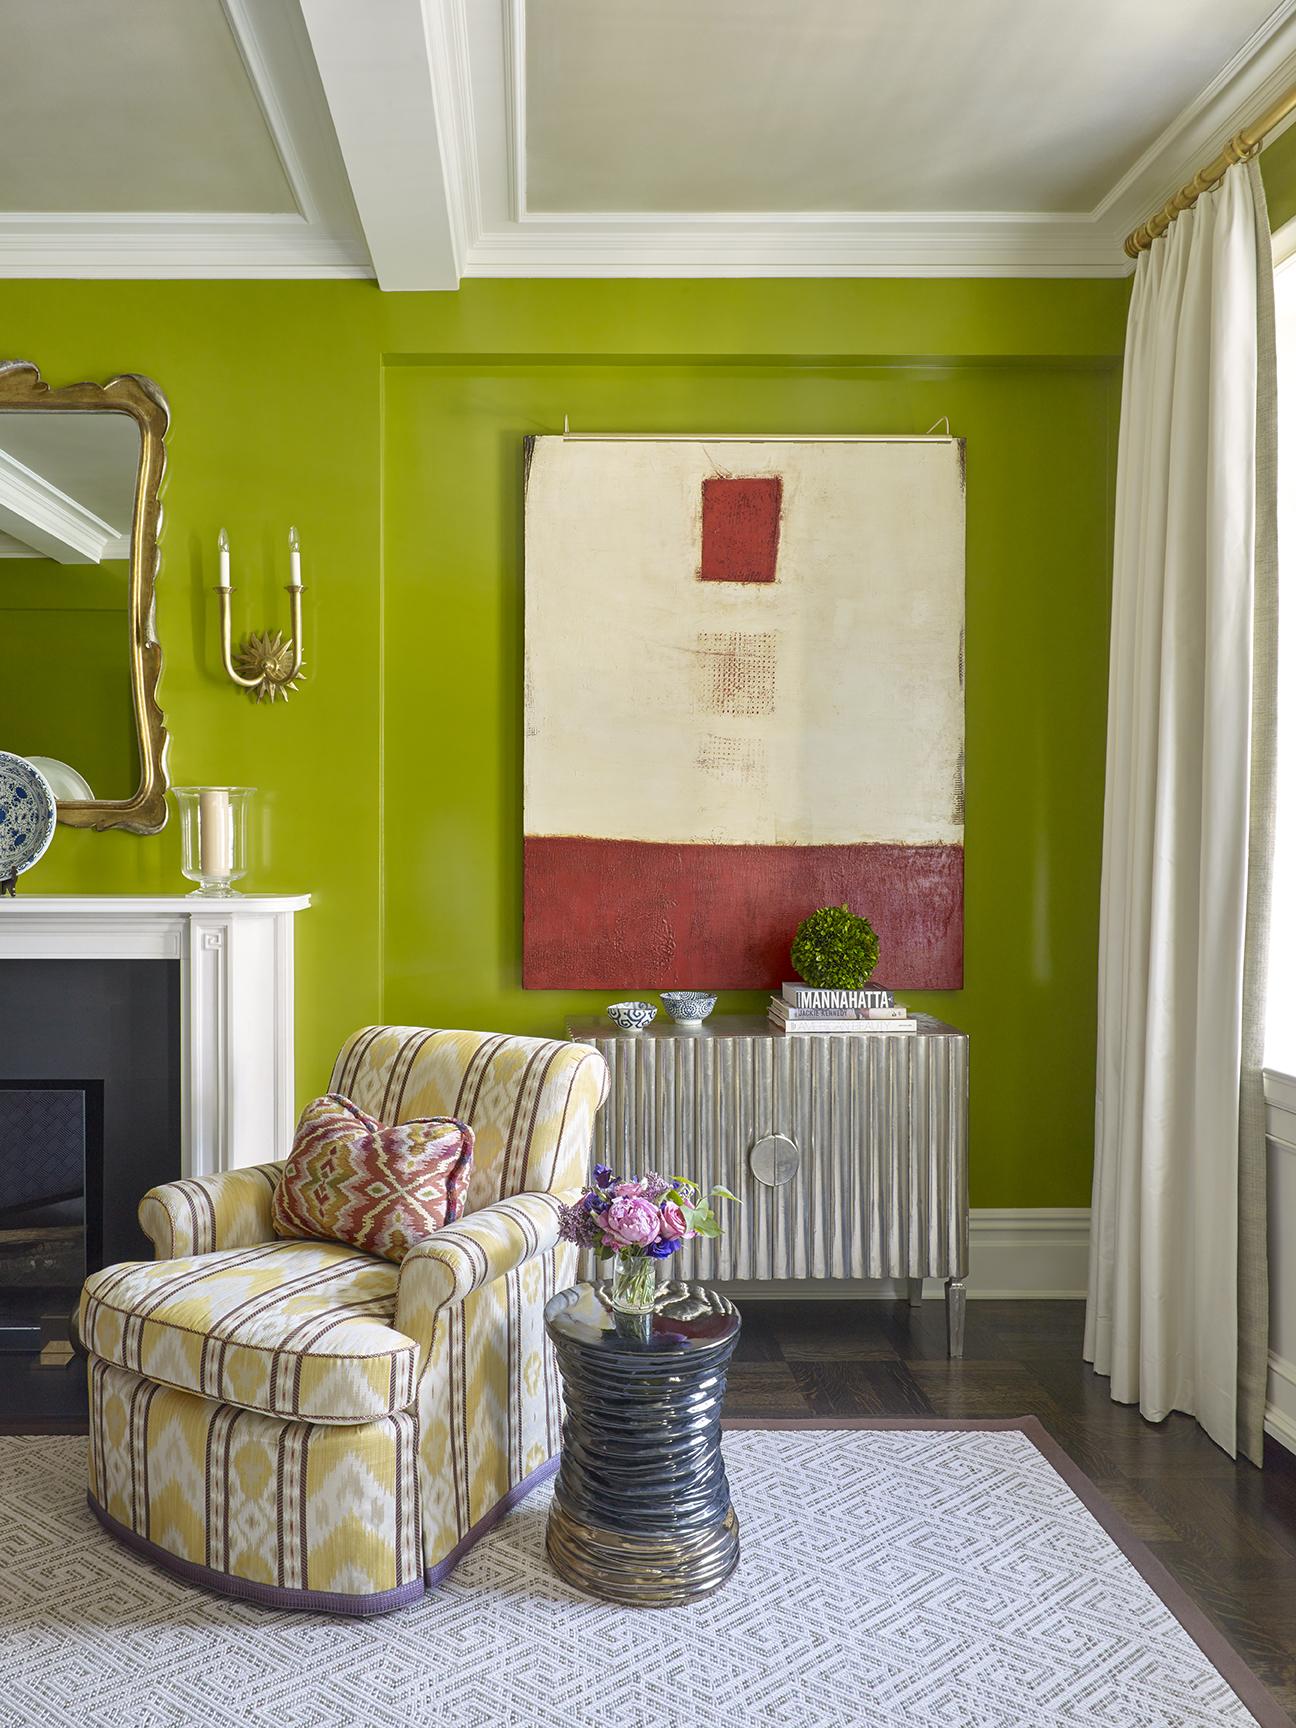 04_Living Room_PTINC_Photo Credit_ Peter Murdock